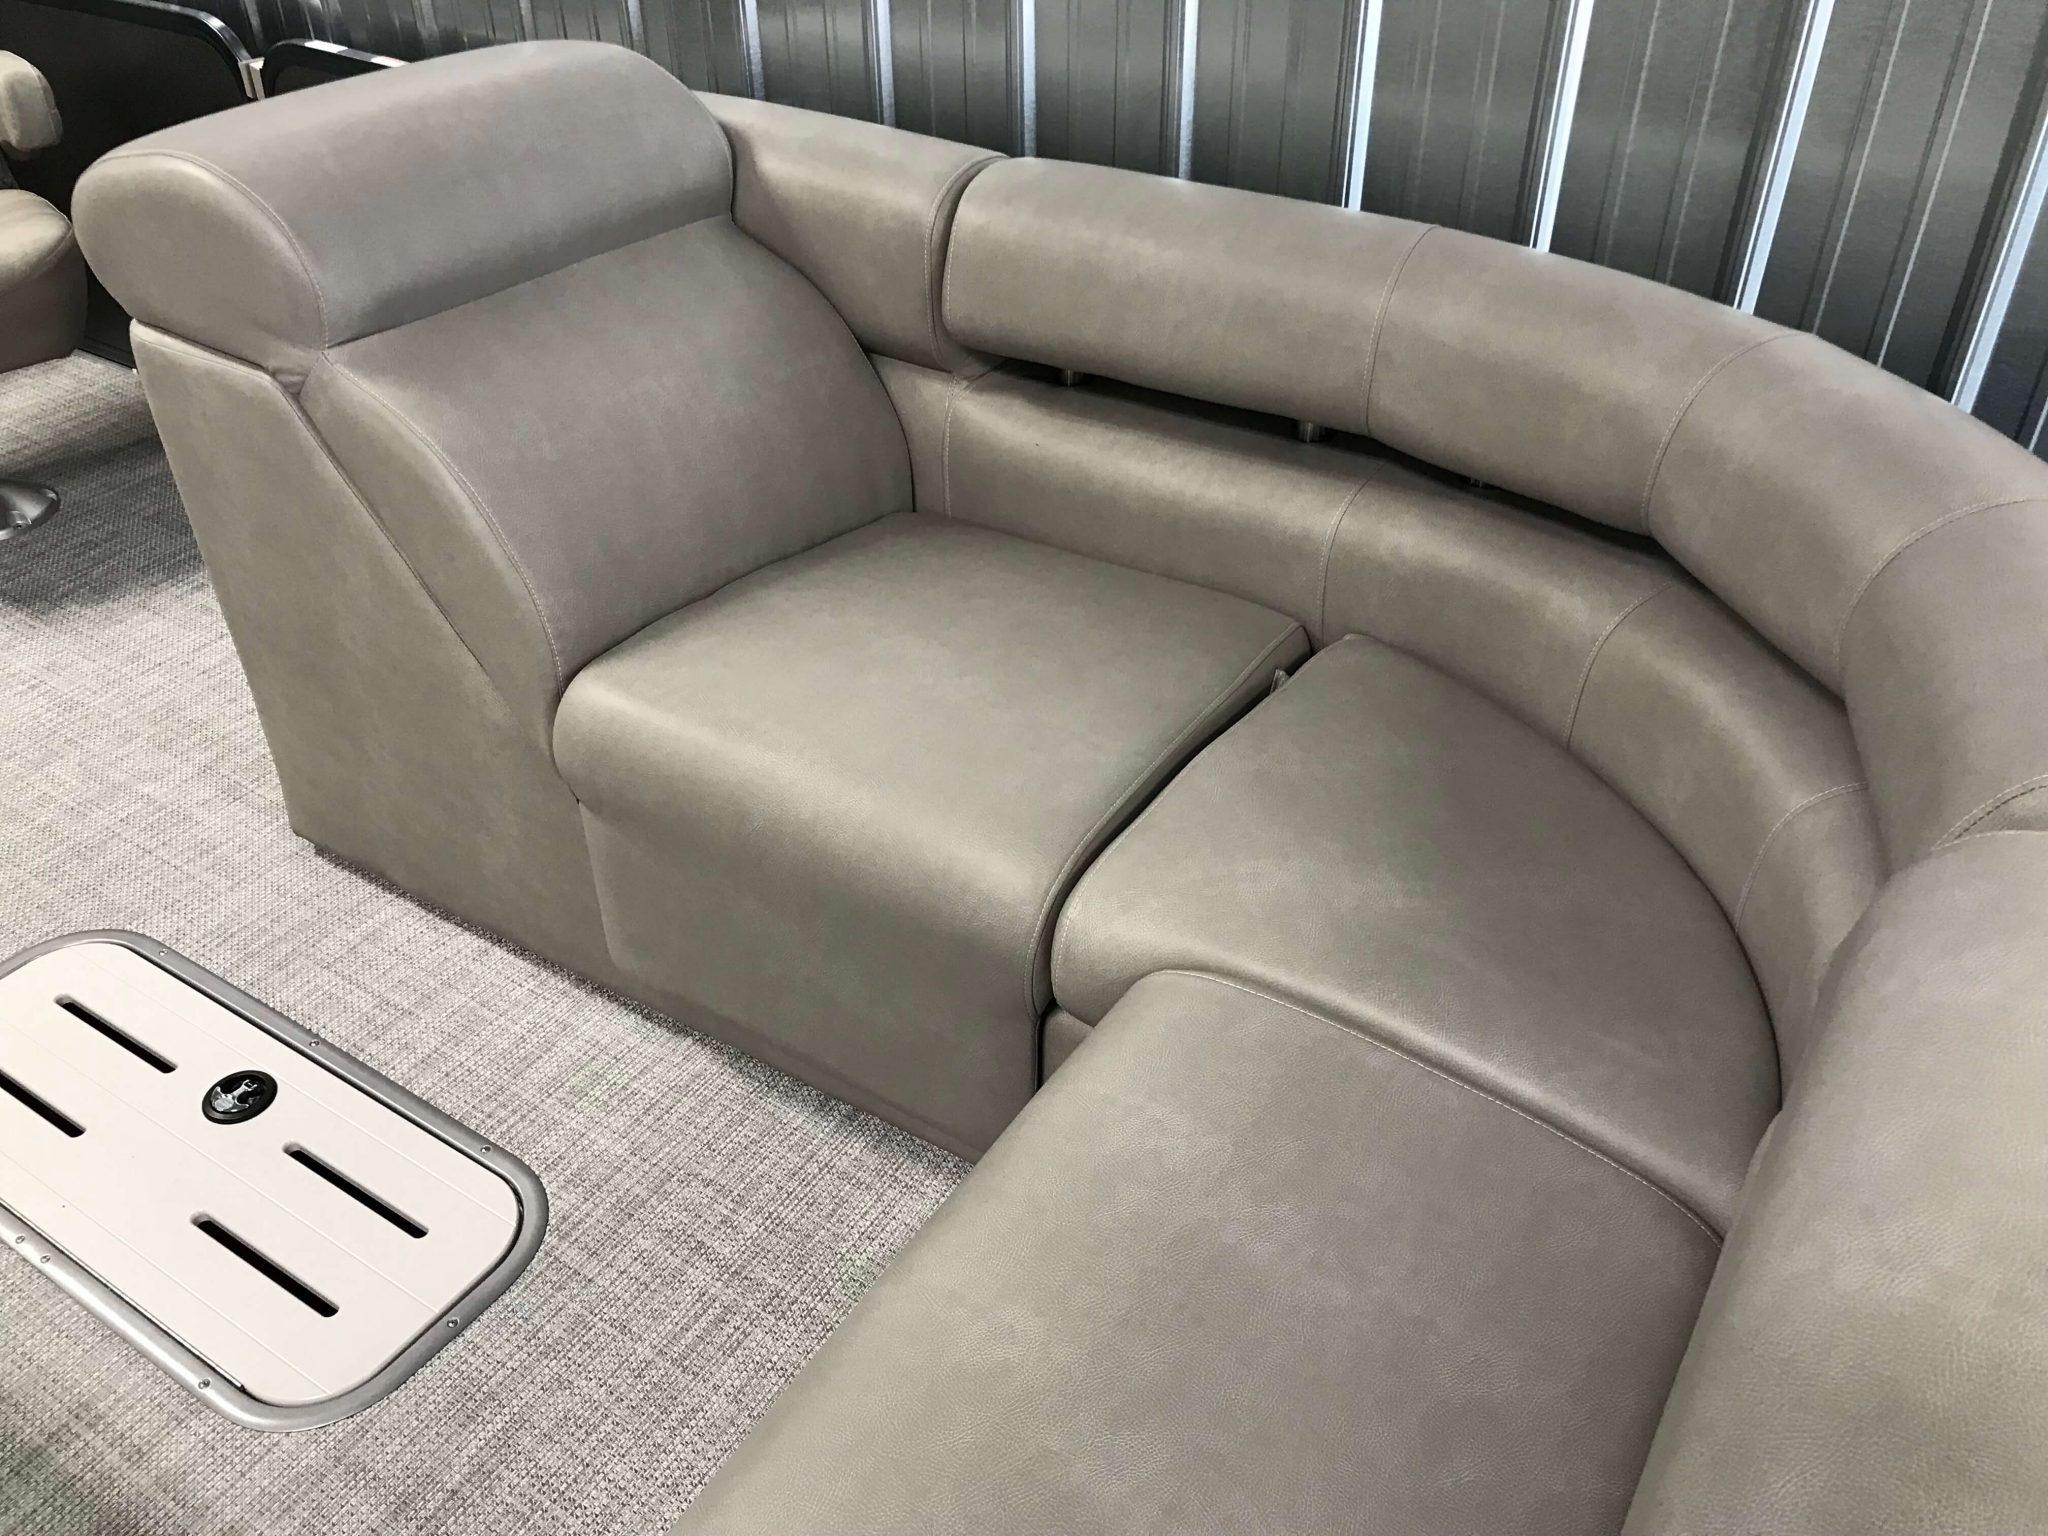 2019 Premier 250 Grand Majestic RF Tritoon Interior Seating 3